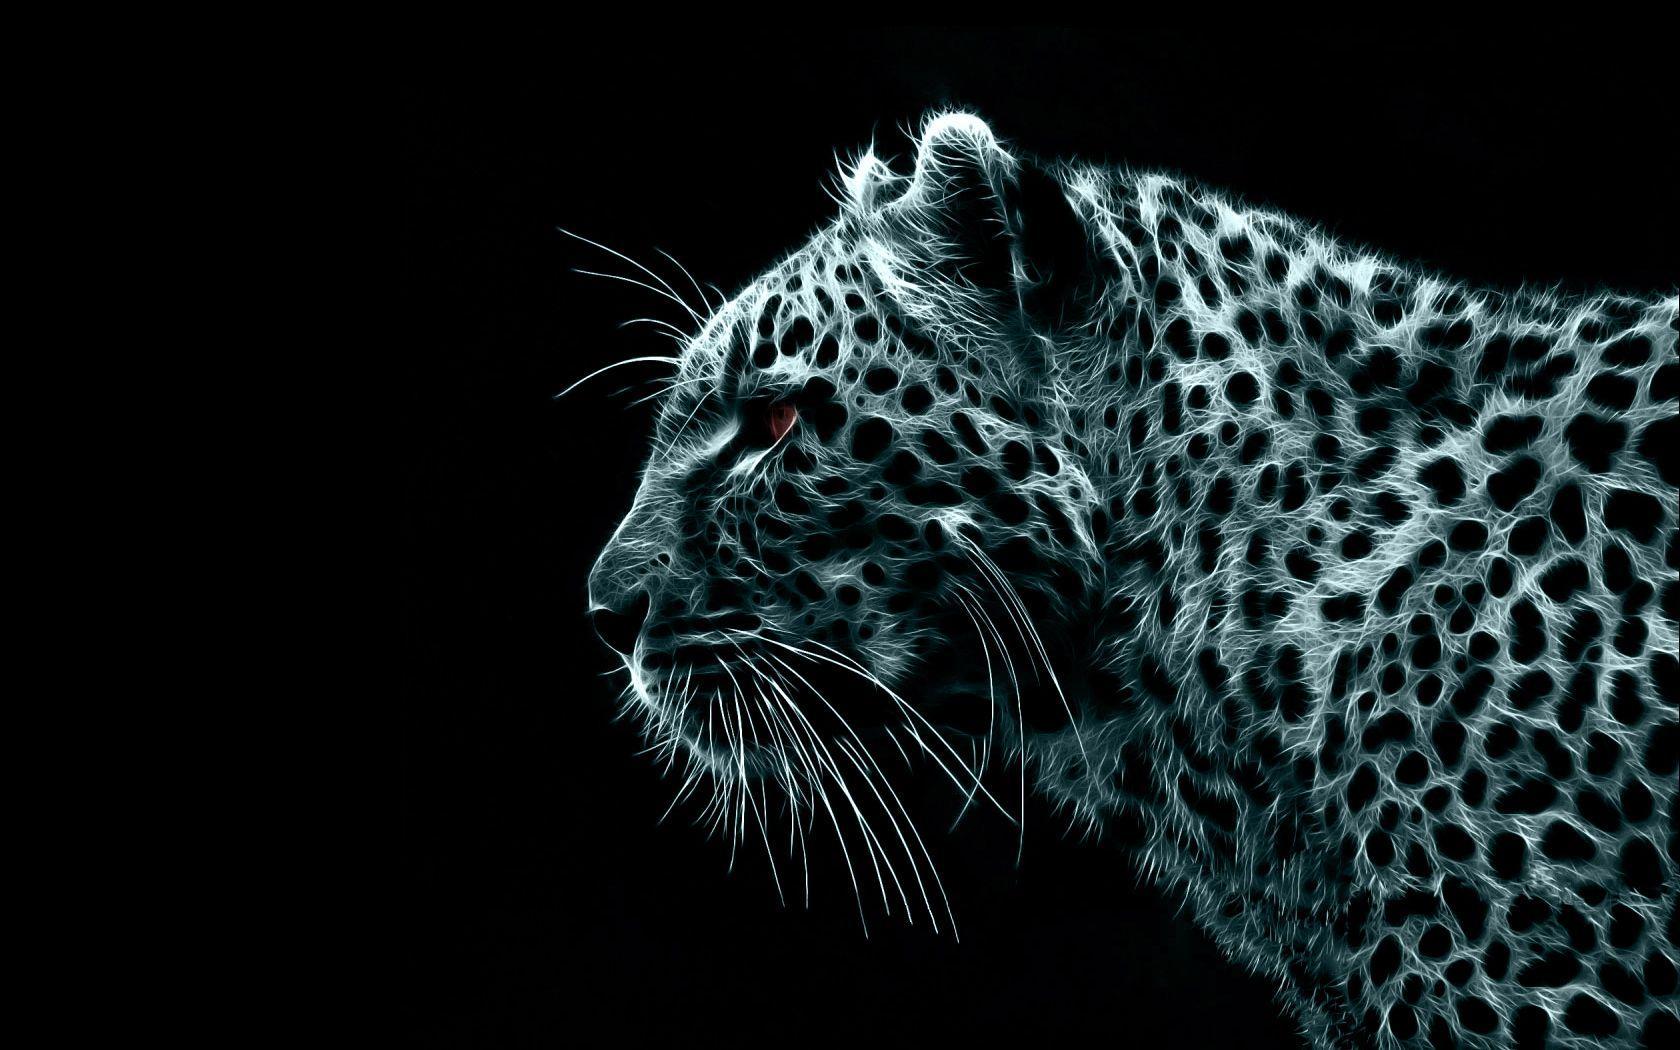 Dark Animals Wallpapers Top Free Dark Animals Backgrounds Wallpaperaccess